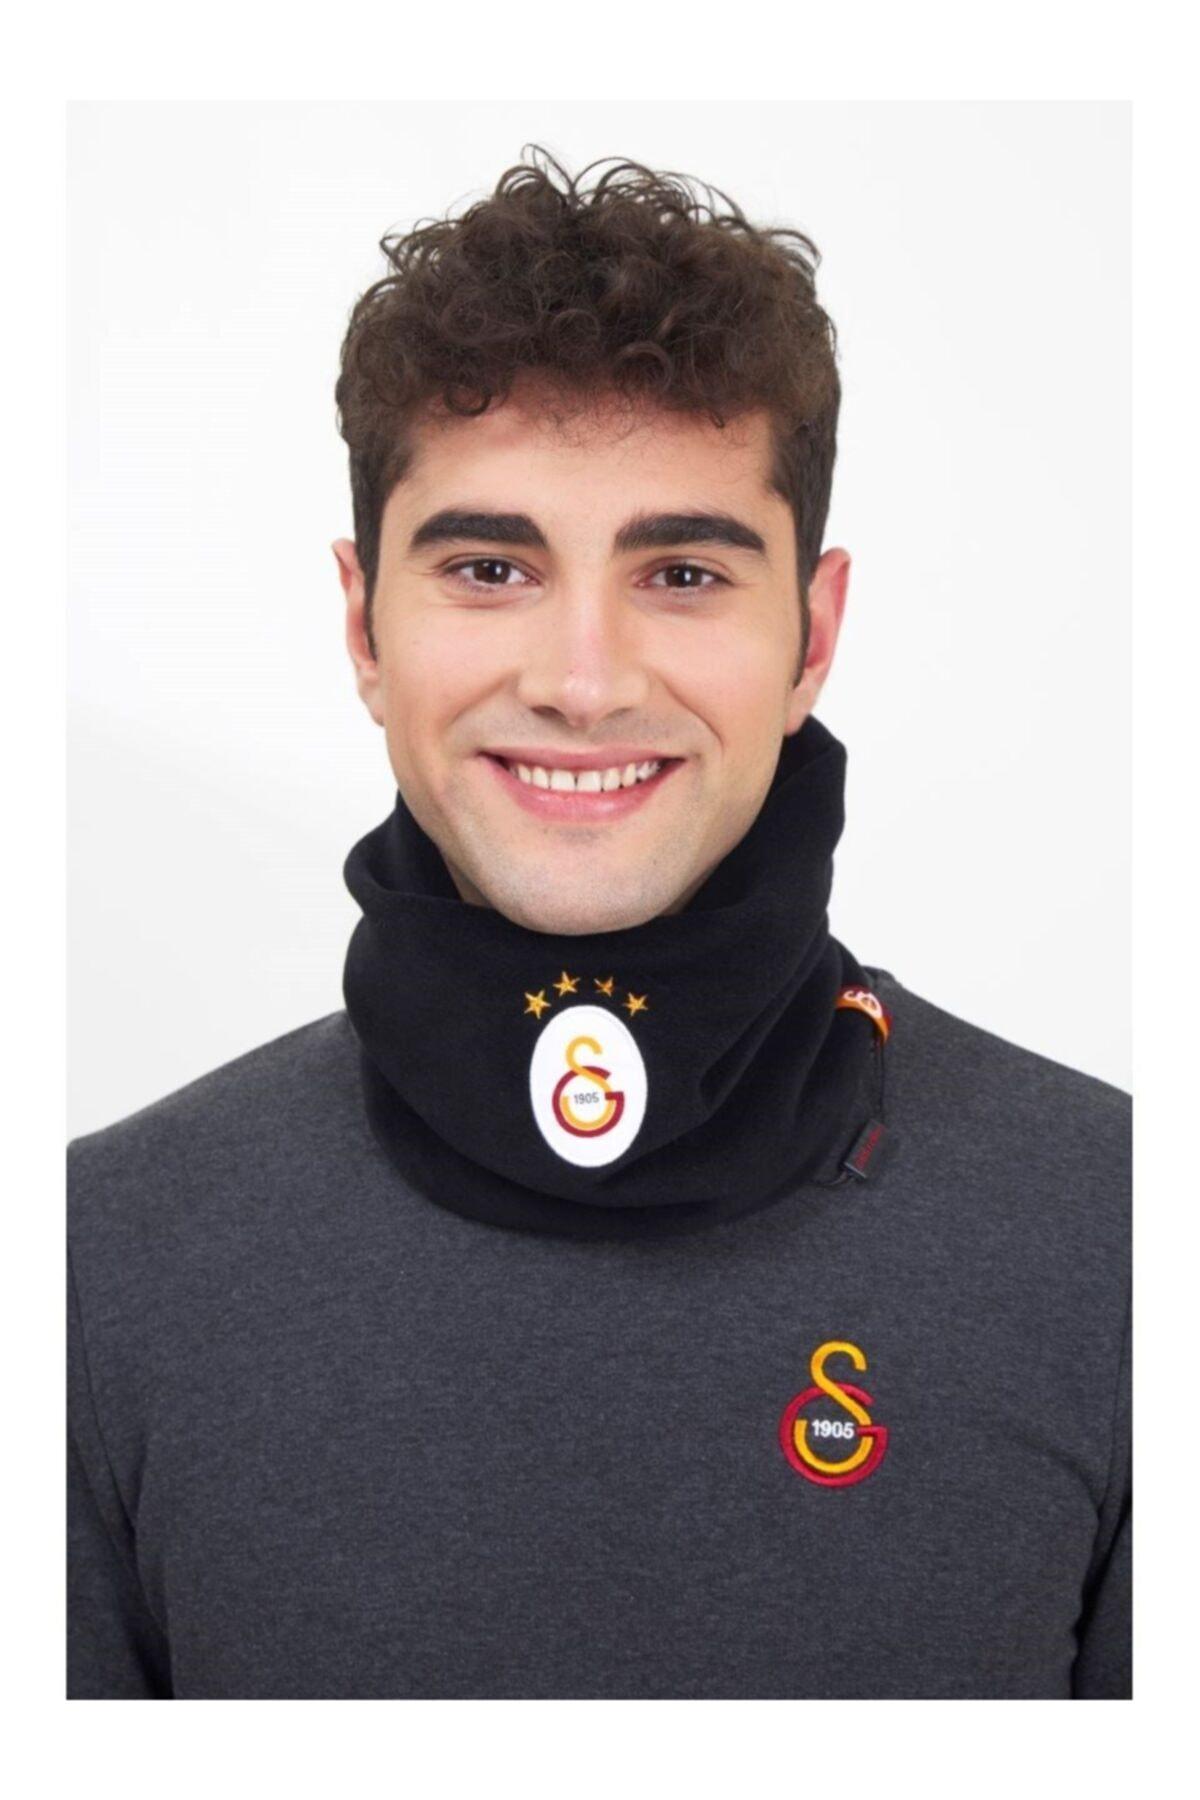 Galatasaray Galatasaray Orjinal Lisanslı Polar Boyunluk Bere